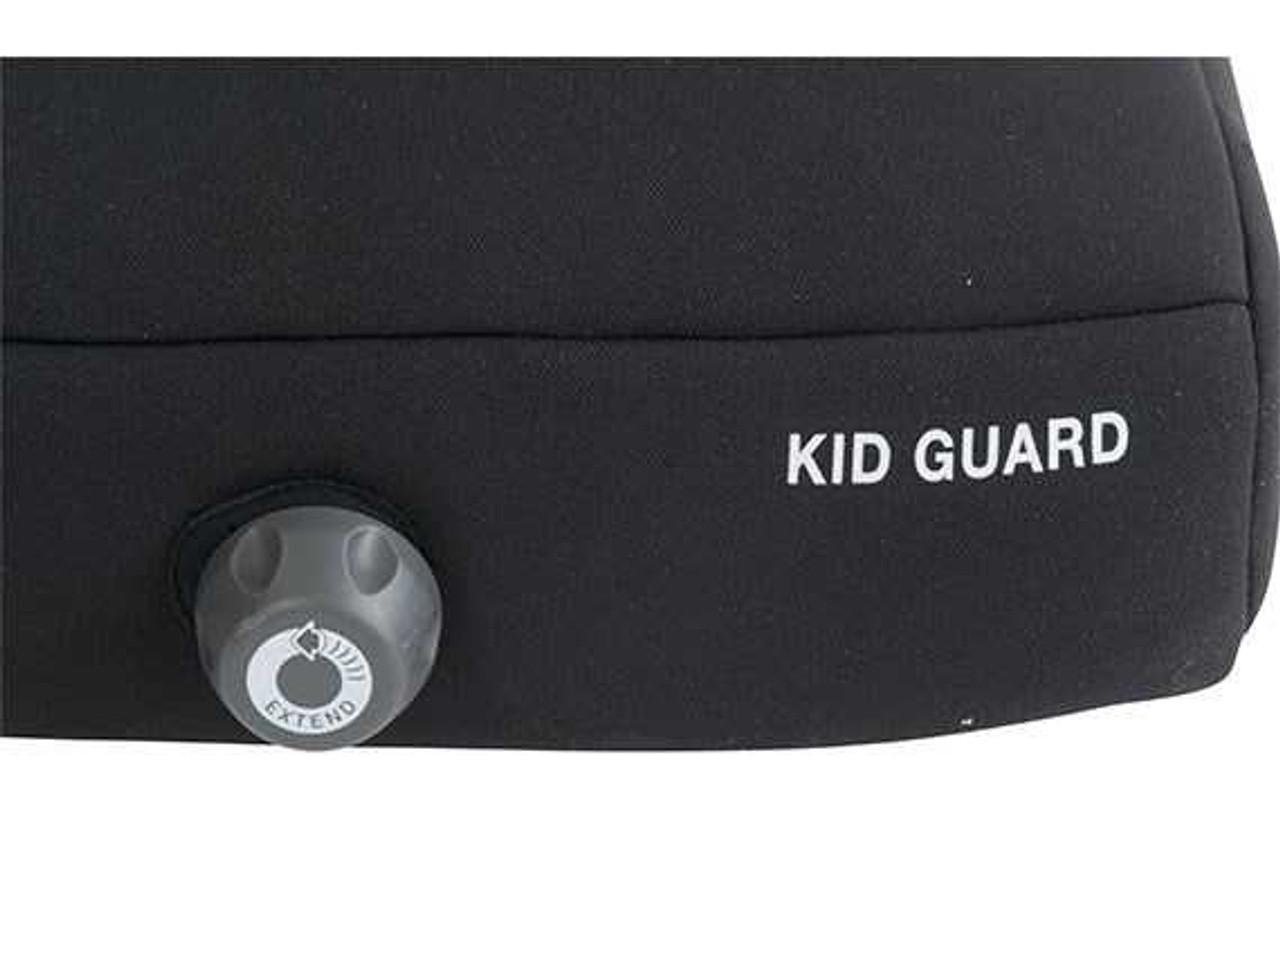 Britax Safe n Sound Kid Guard